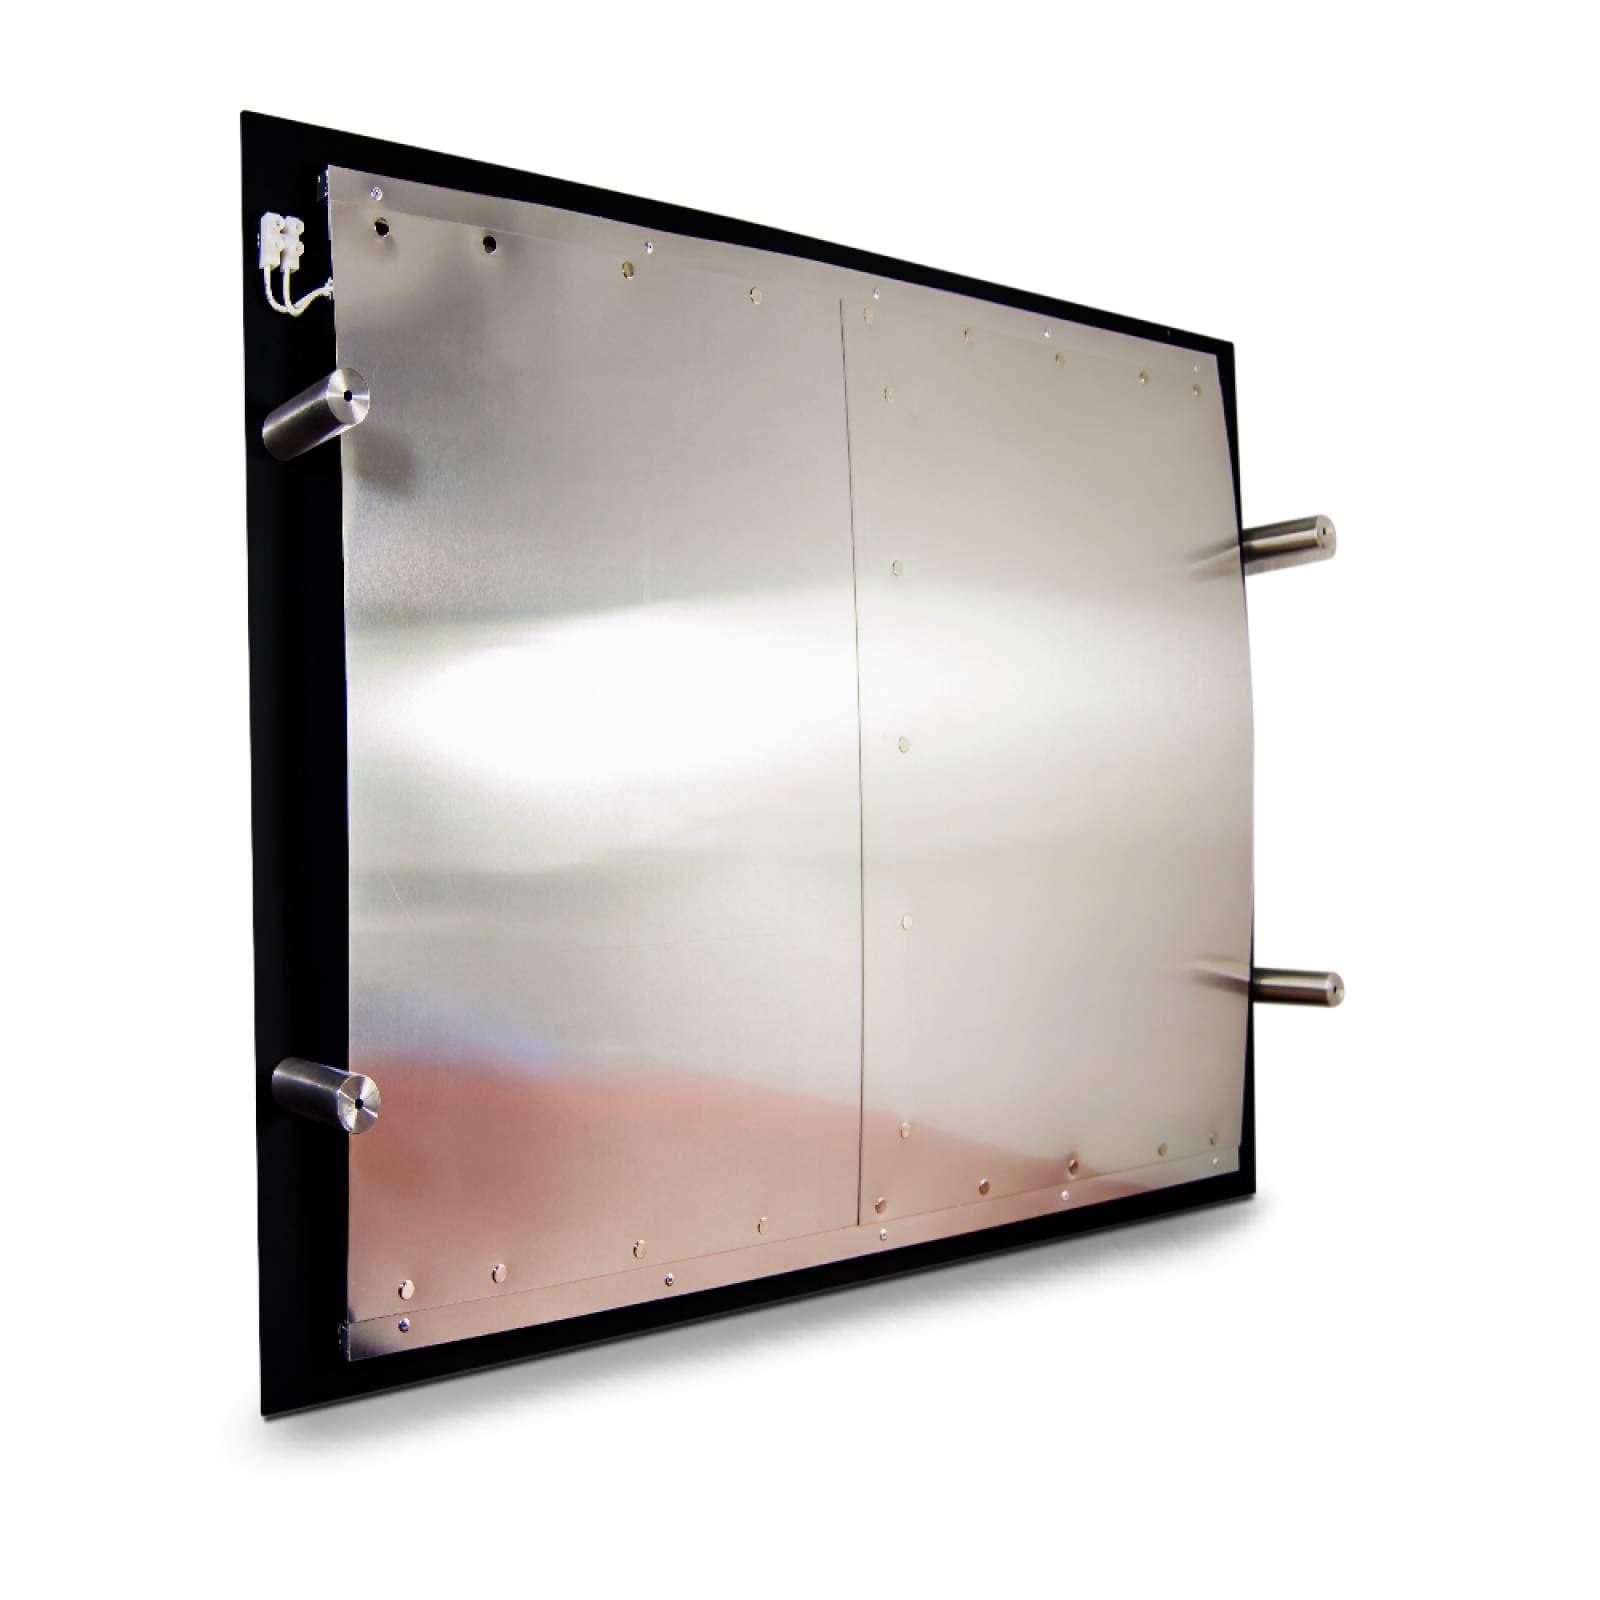 Calefactor de Panel infrarrojo en Cristal para Techo, Arizona Wave White Star de 380W 60x60cm, Mod: 342CaSol-TB